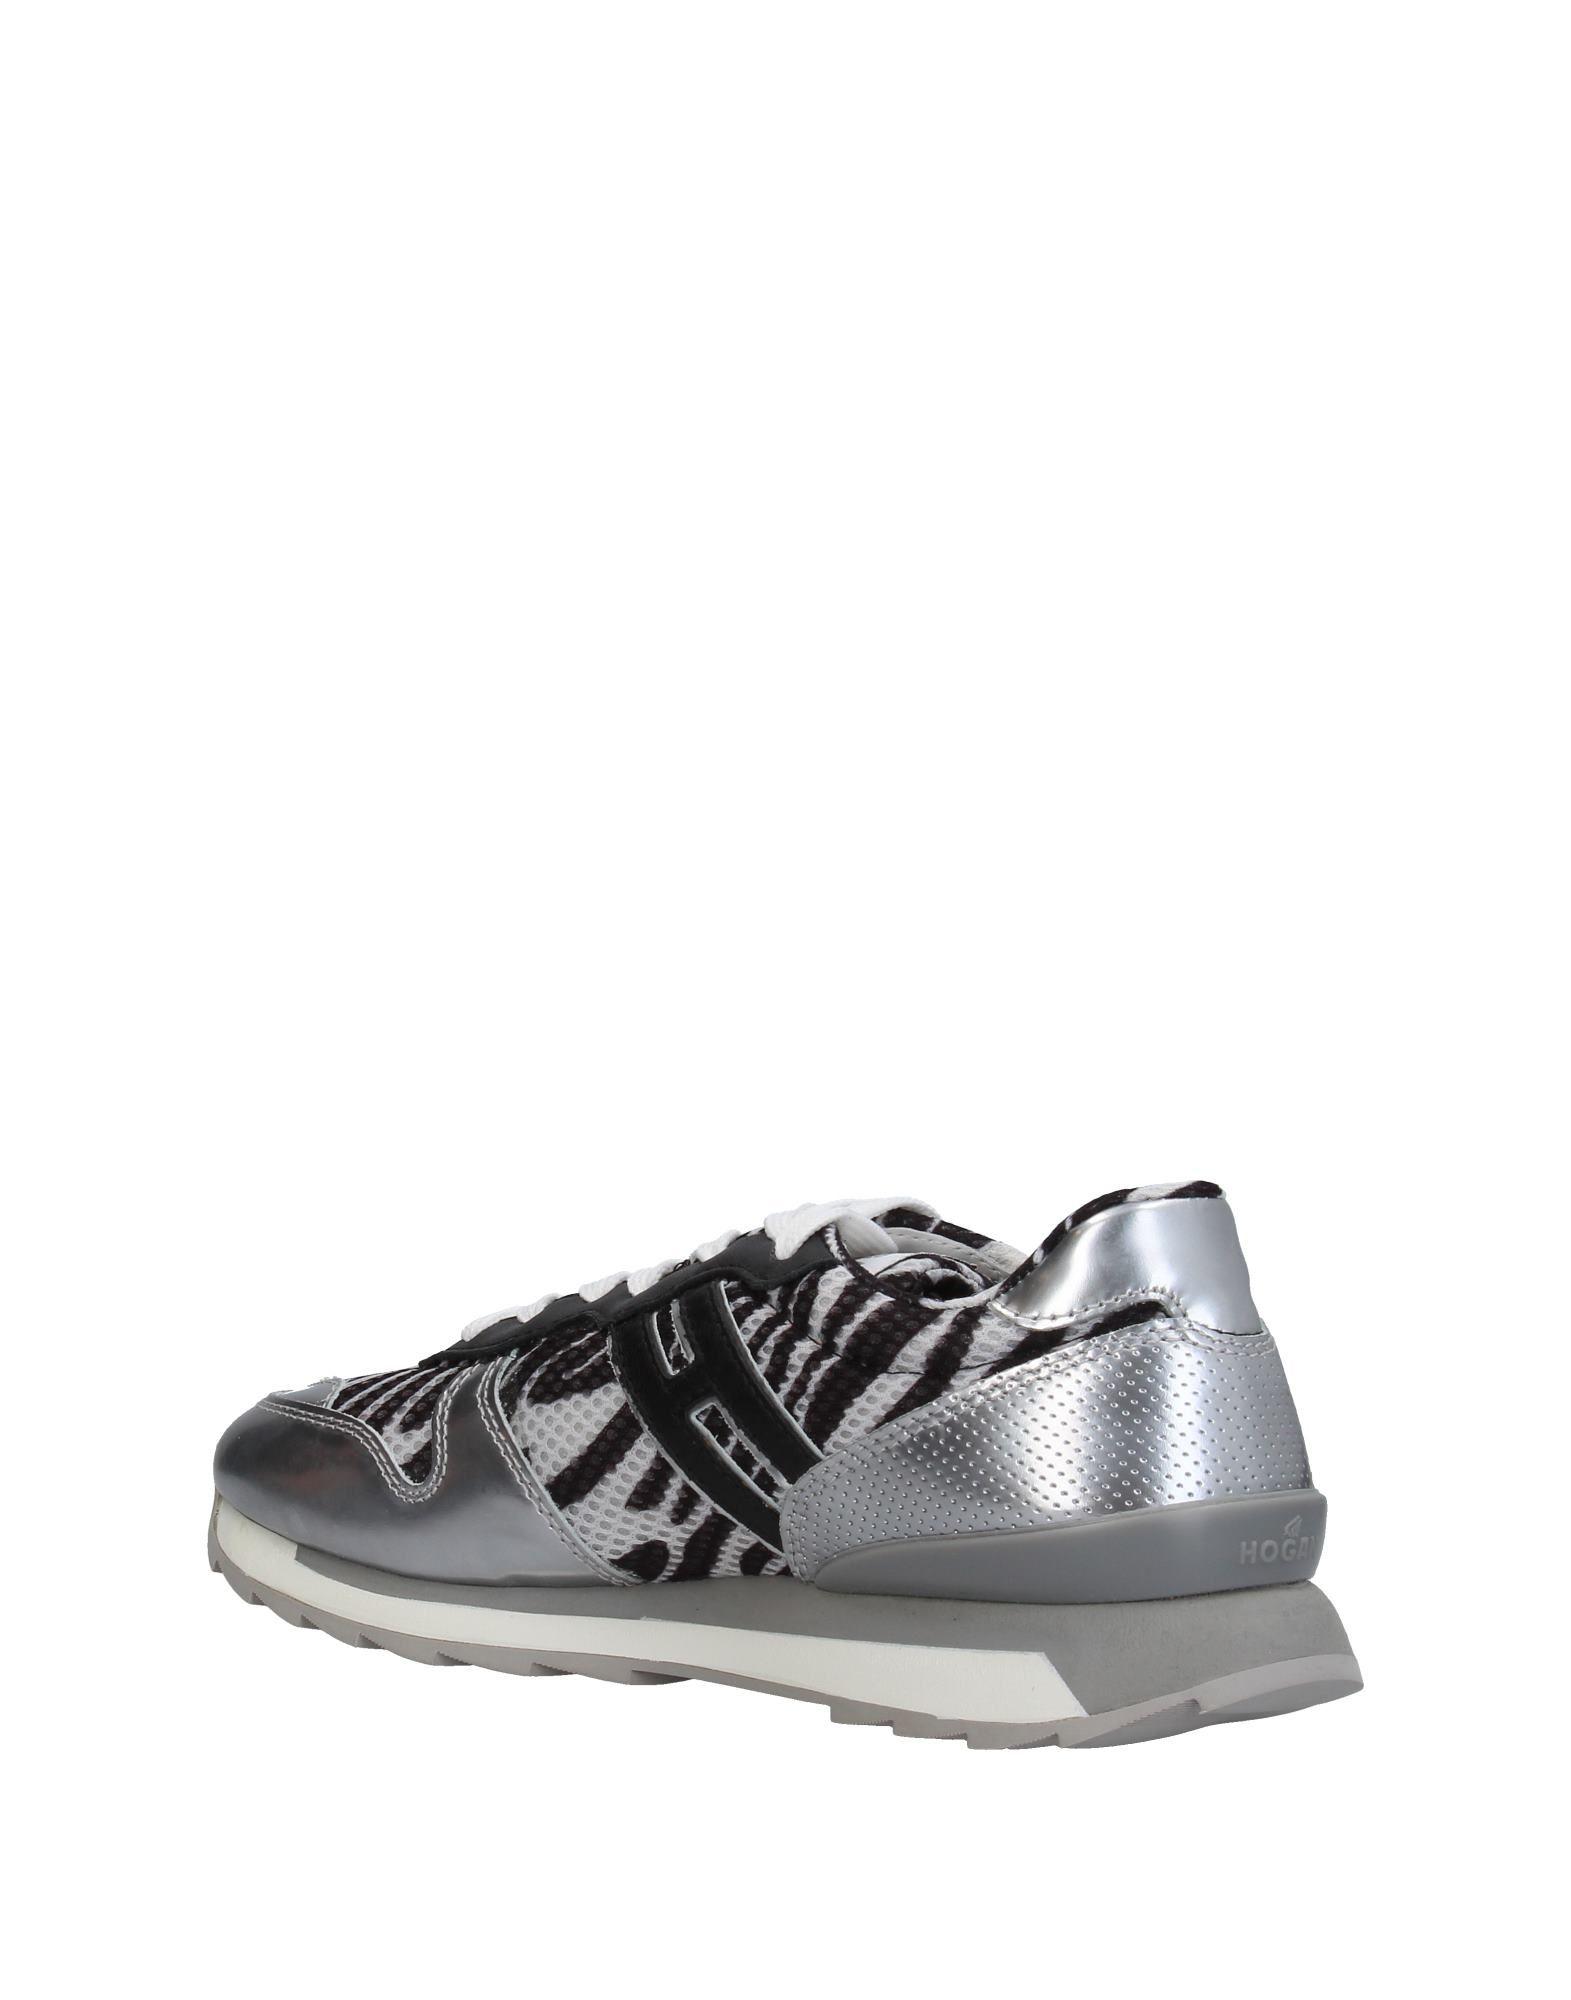 Hogan Rebel  Sneakers Damen  Rebel 11396131MR Gute Qualität beliebte Schuhe 18feef